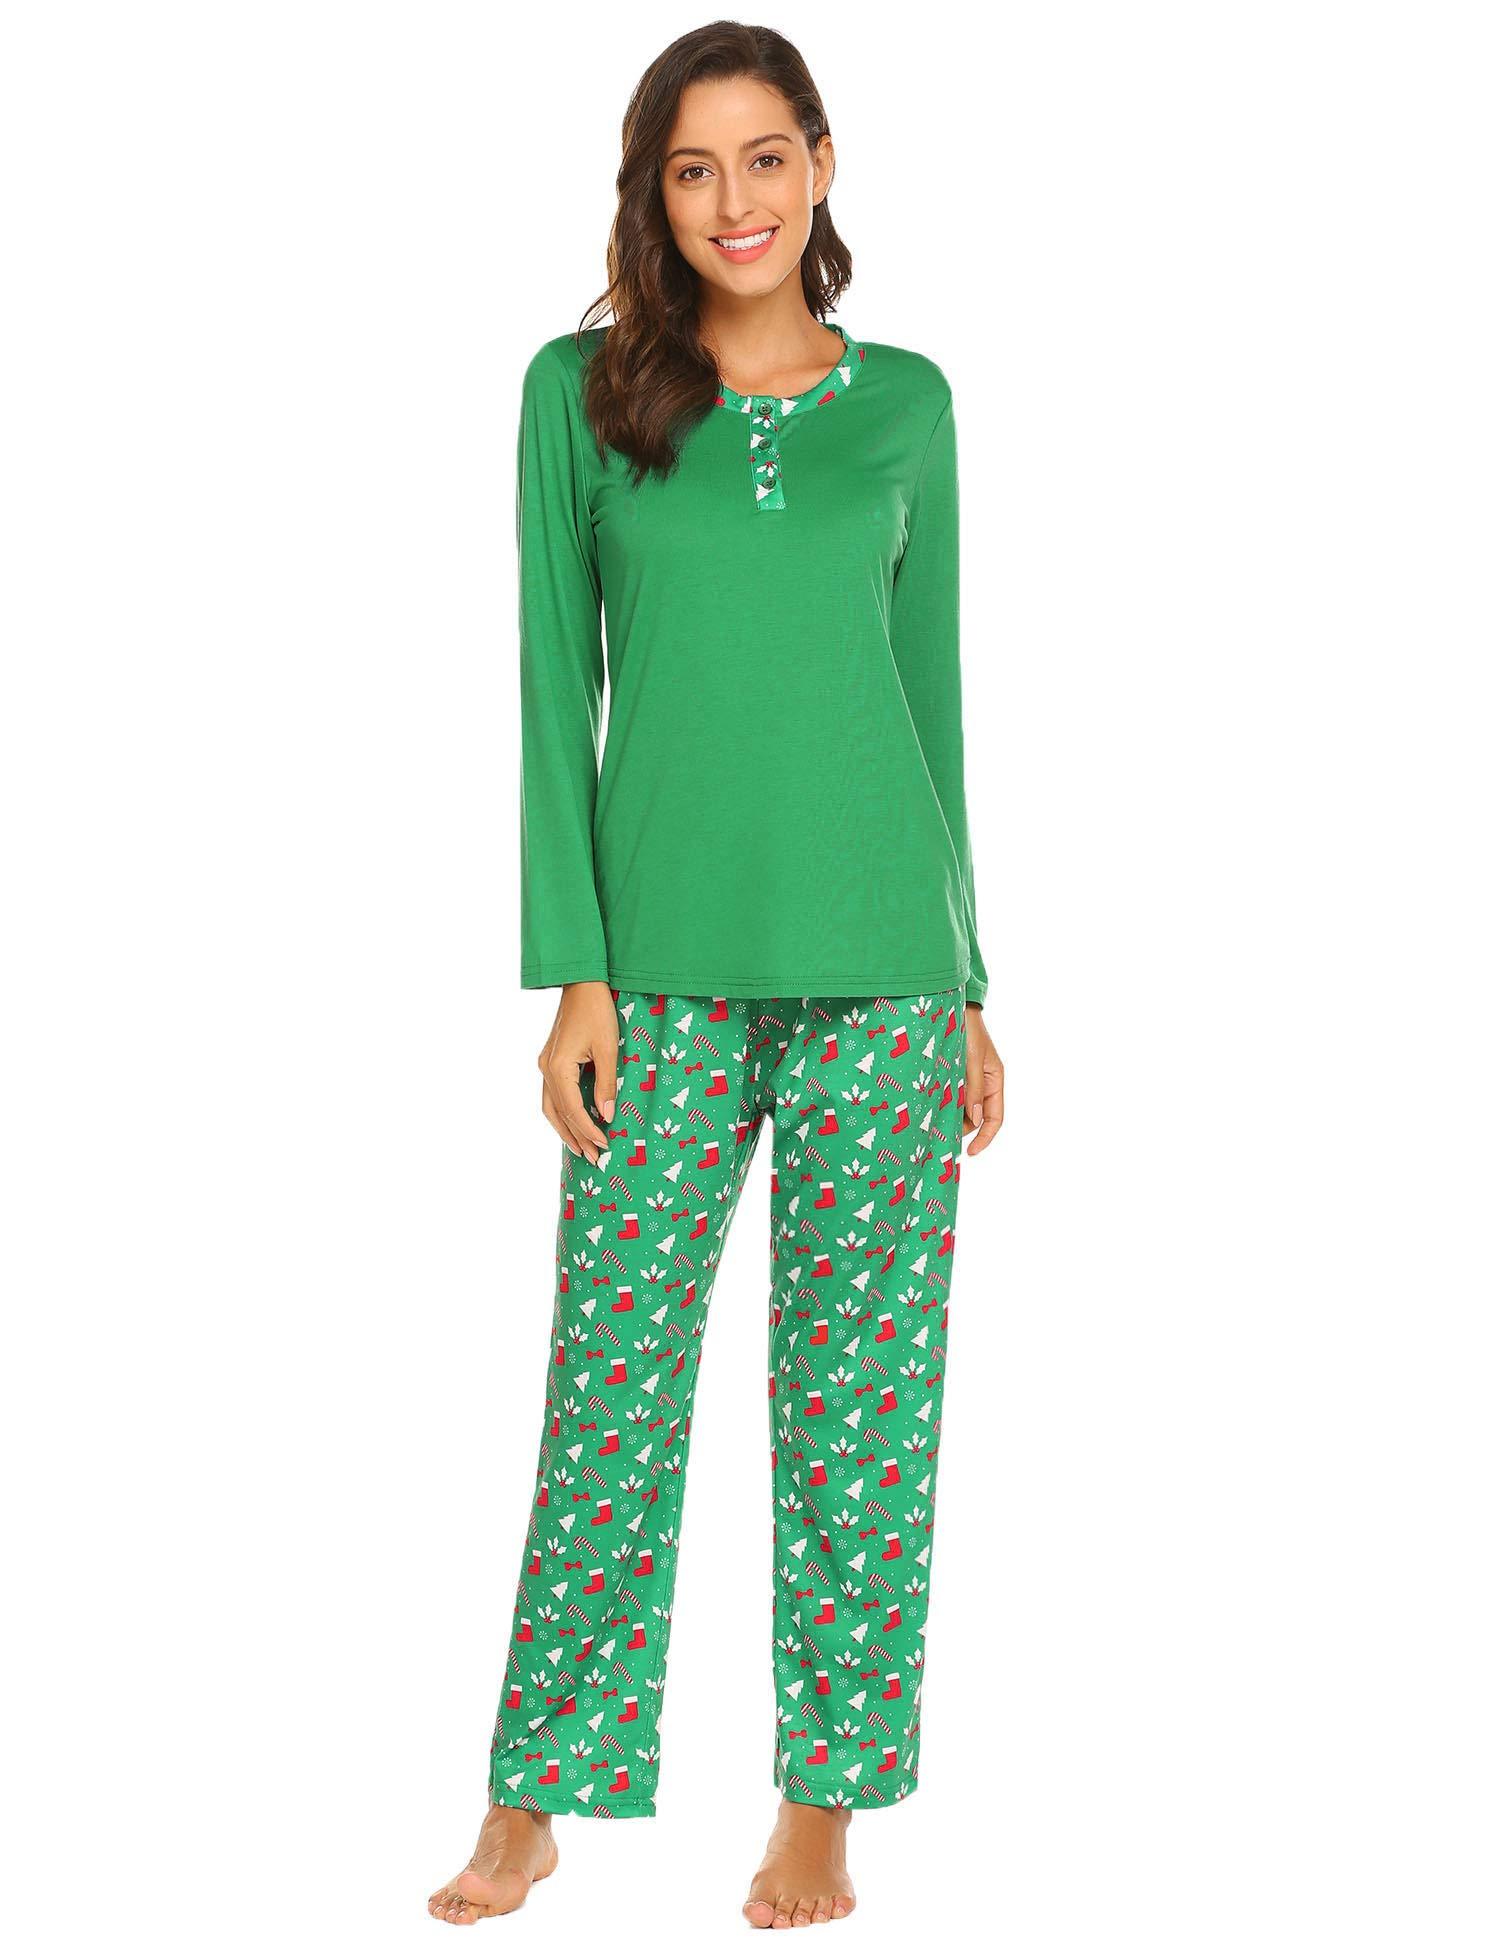 Ekouaer Christmas Pajamas Set Matching Family Christmas Pjs Set Holiday Pajamas for Women Reindeer Sleepwear